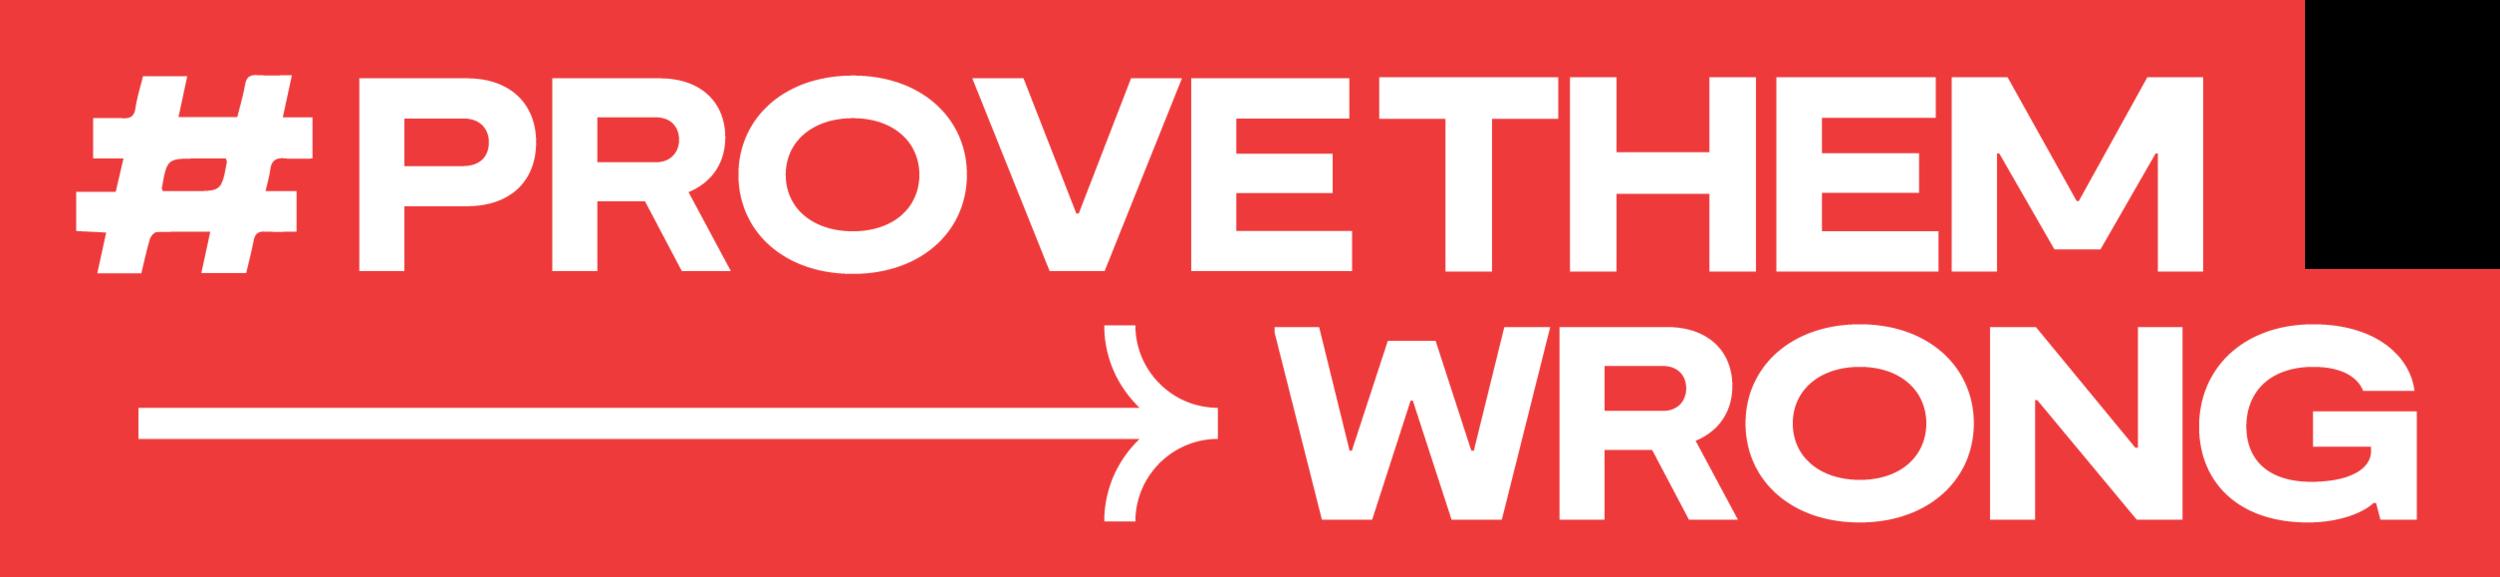 Logo 2 #ProveThemWrong.png